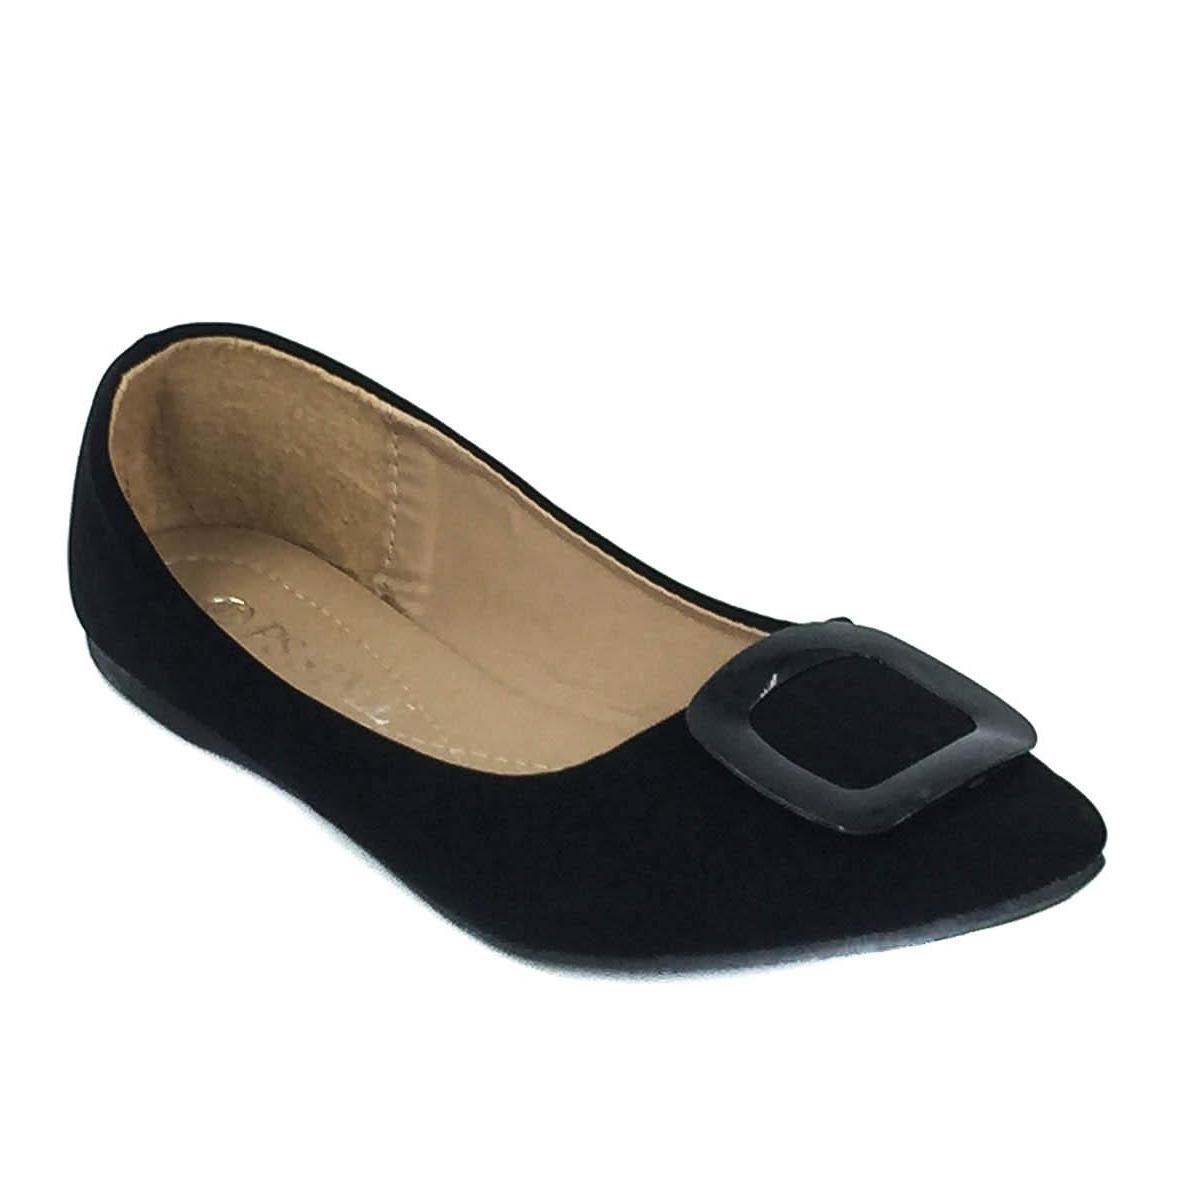 KW Women's Doll Shoes 35-40 #288-9